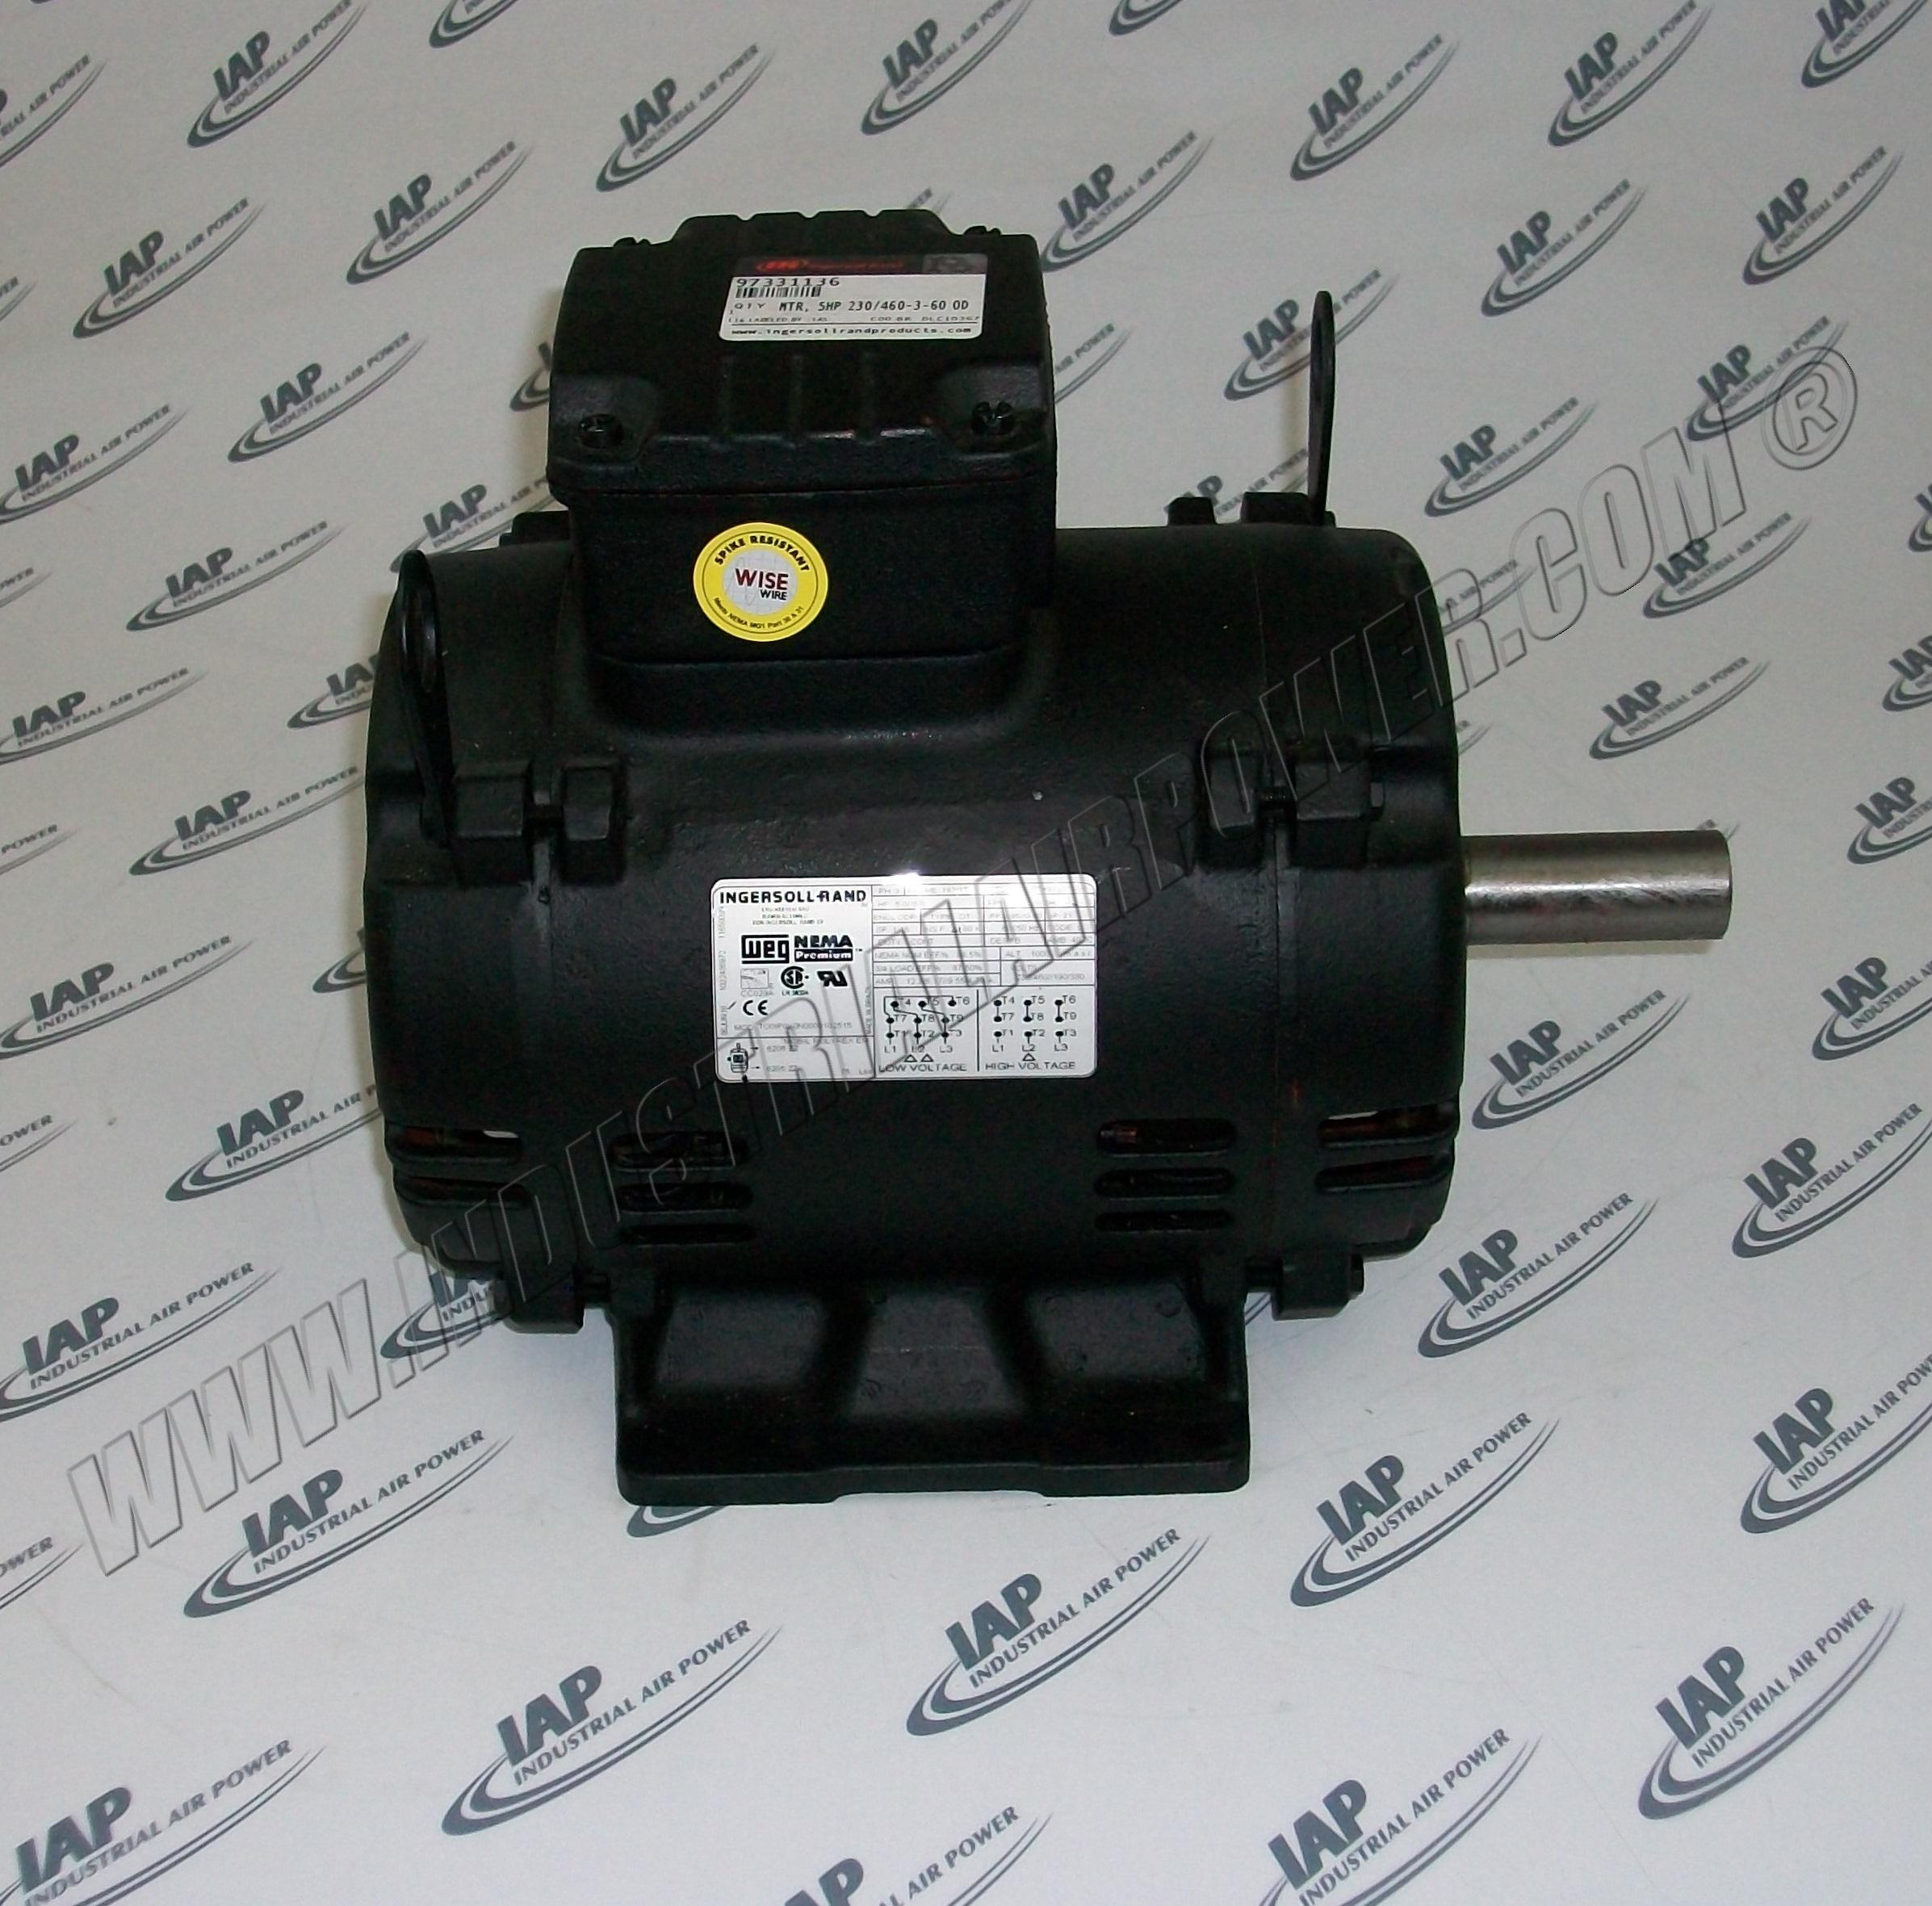 Ingersoll Rand 97331136 Motor